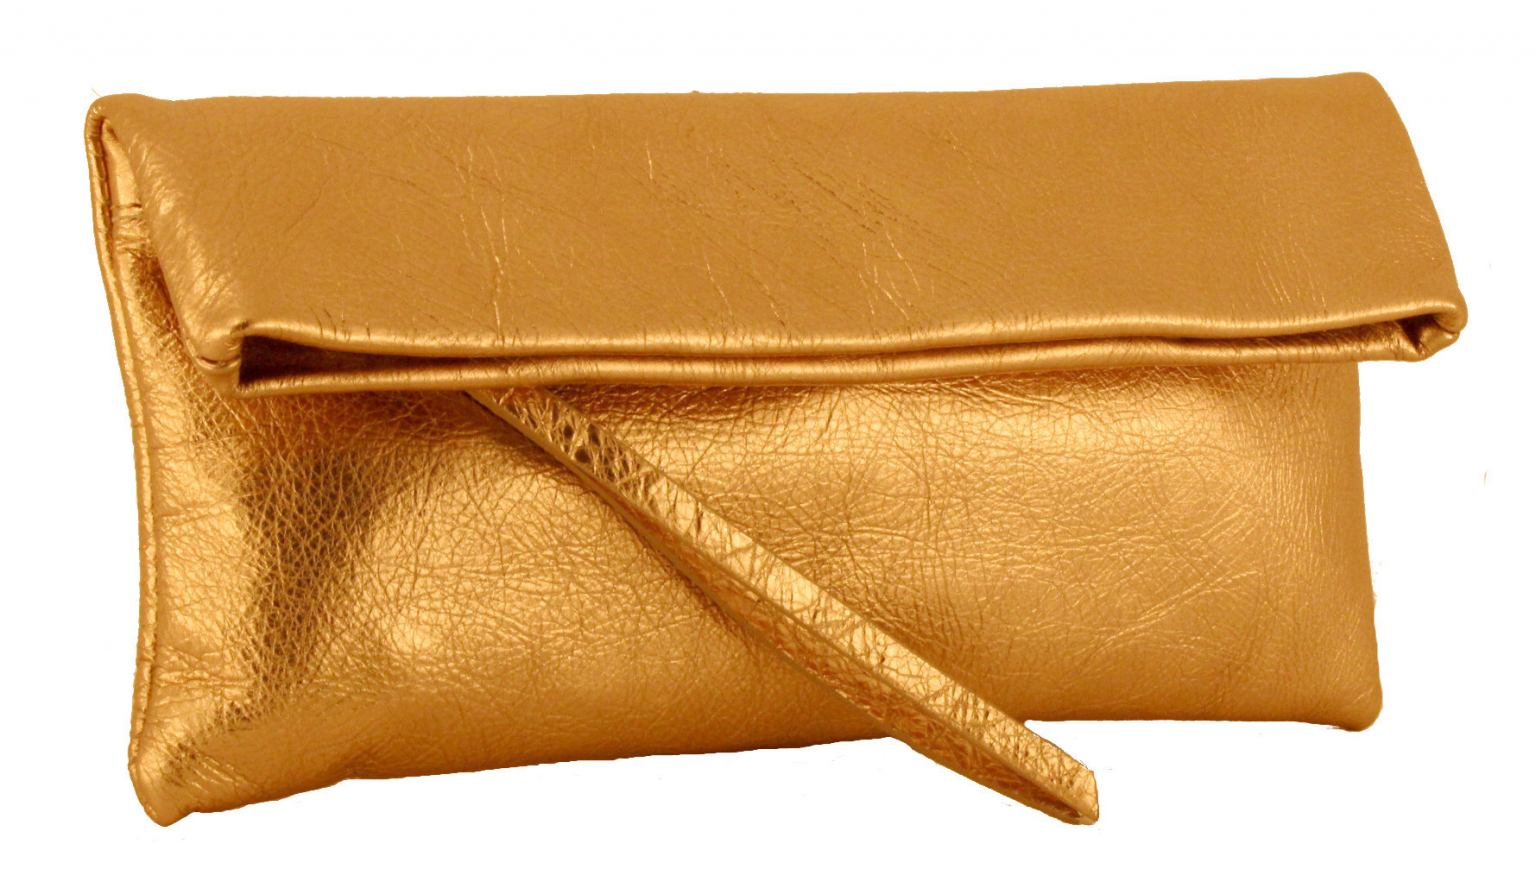 Gianni Chiarini Ledertasche Clutch Rame Bronze